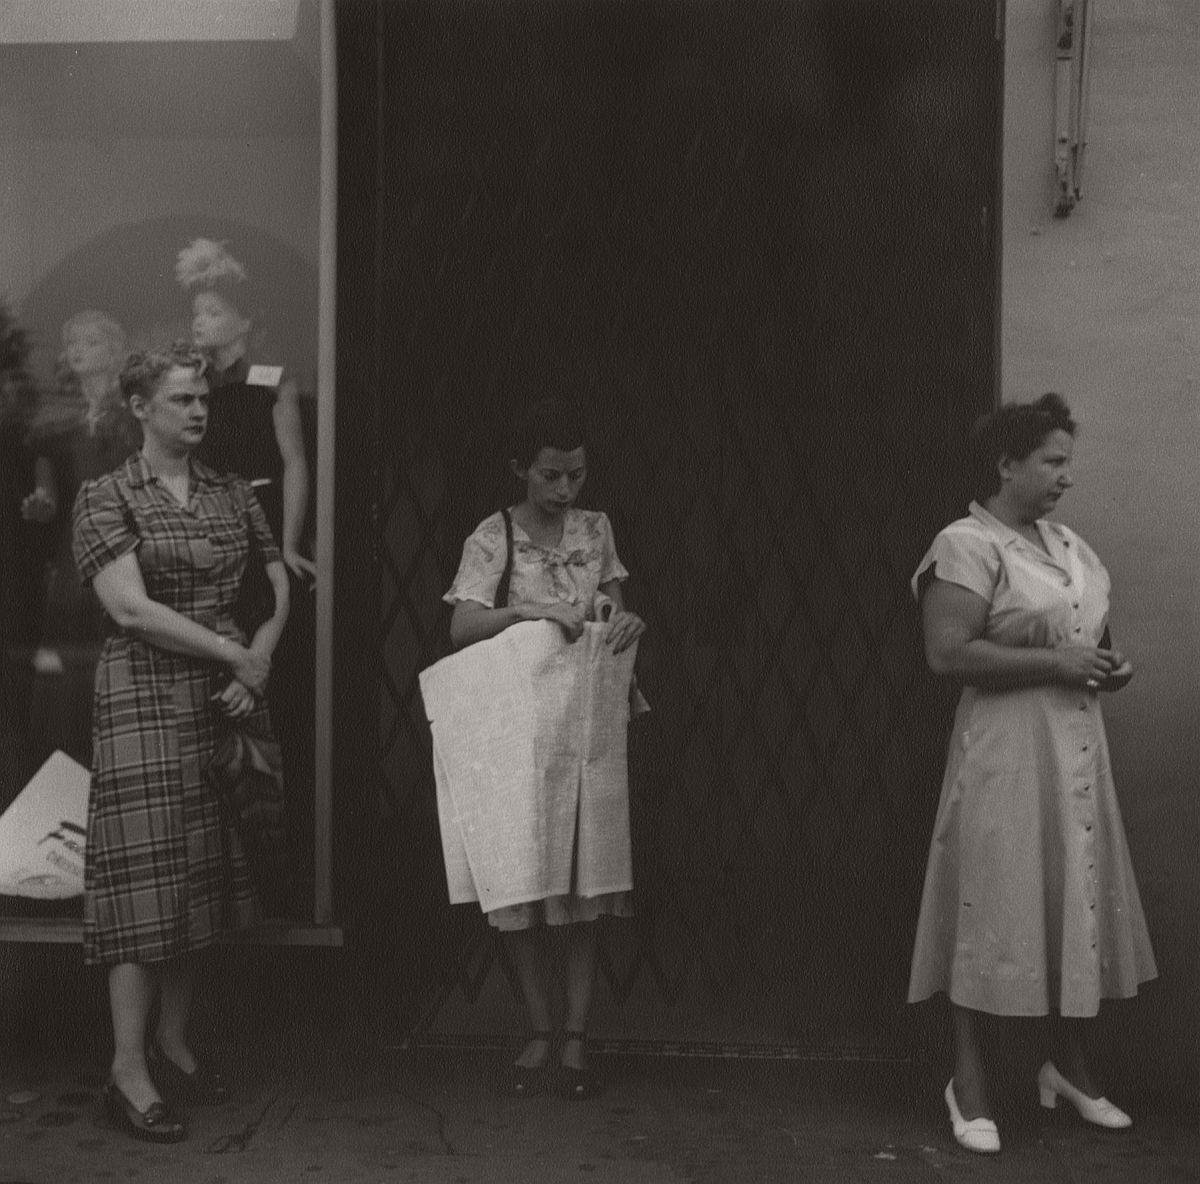 Untitled (three women), c.1948